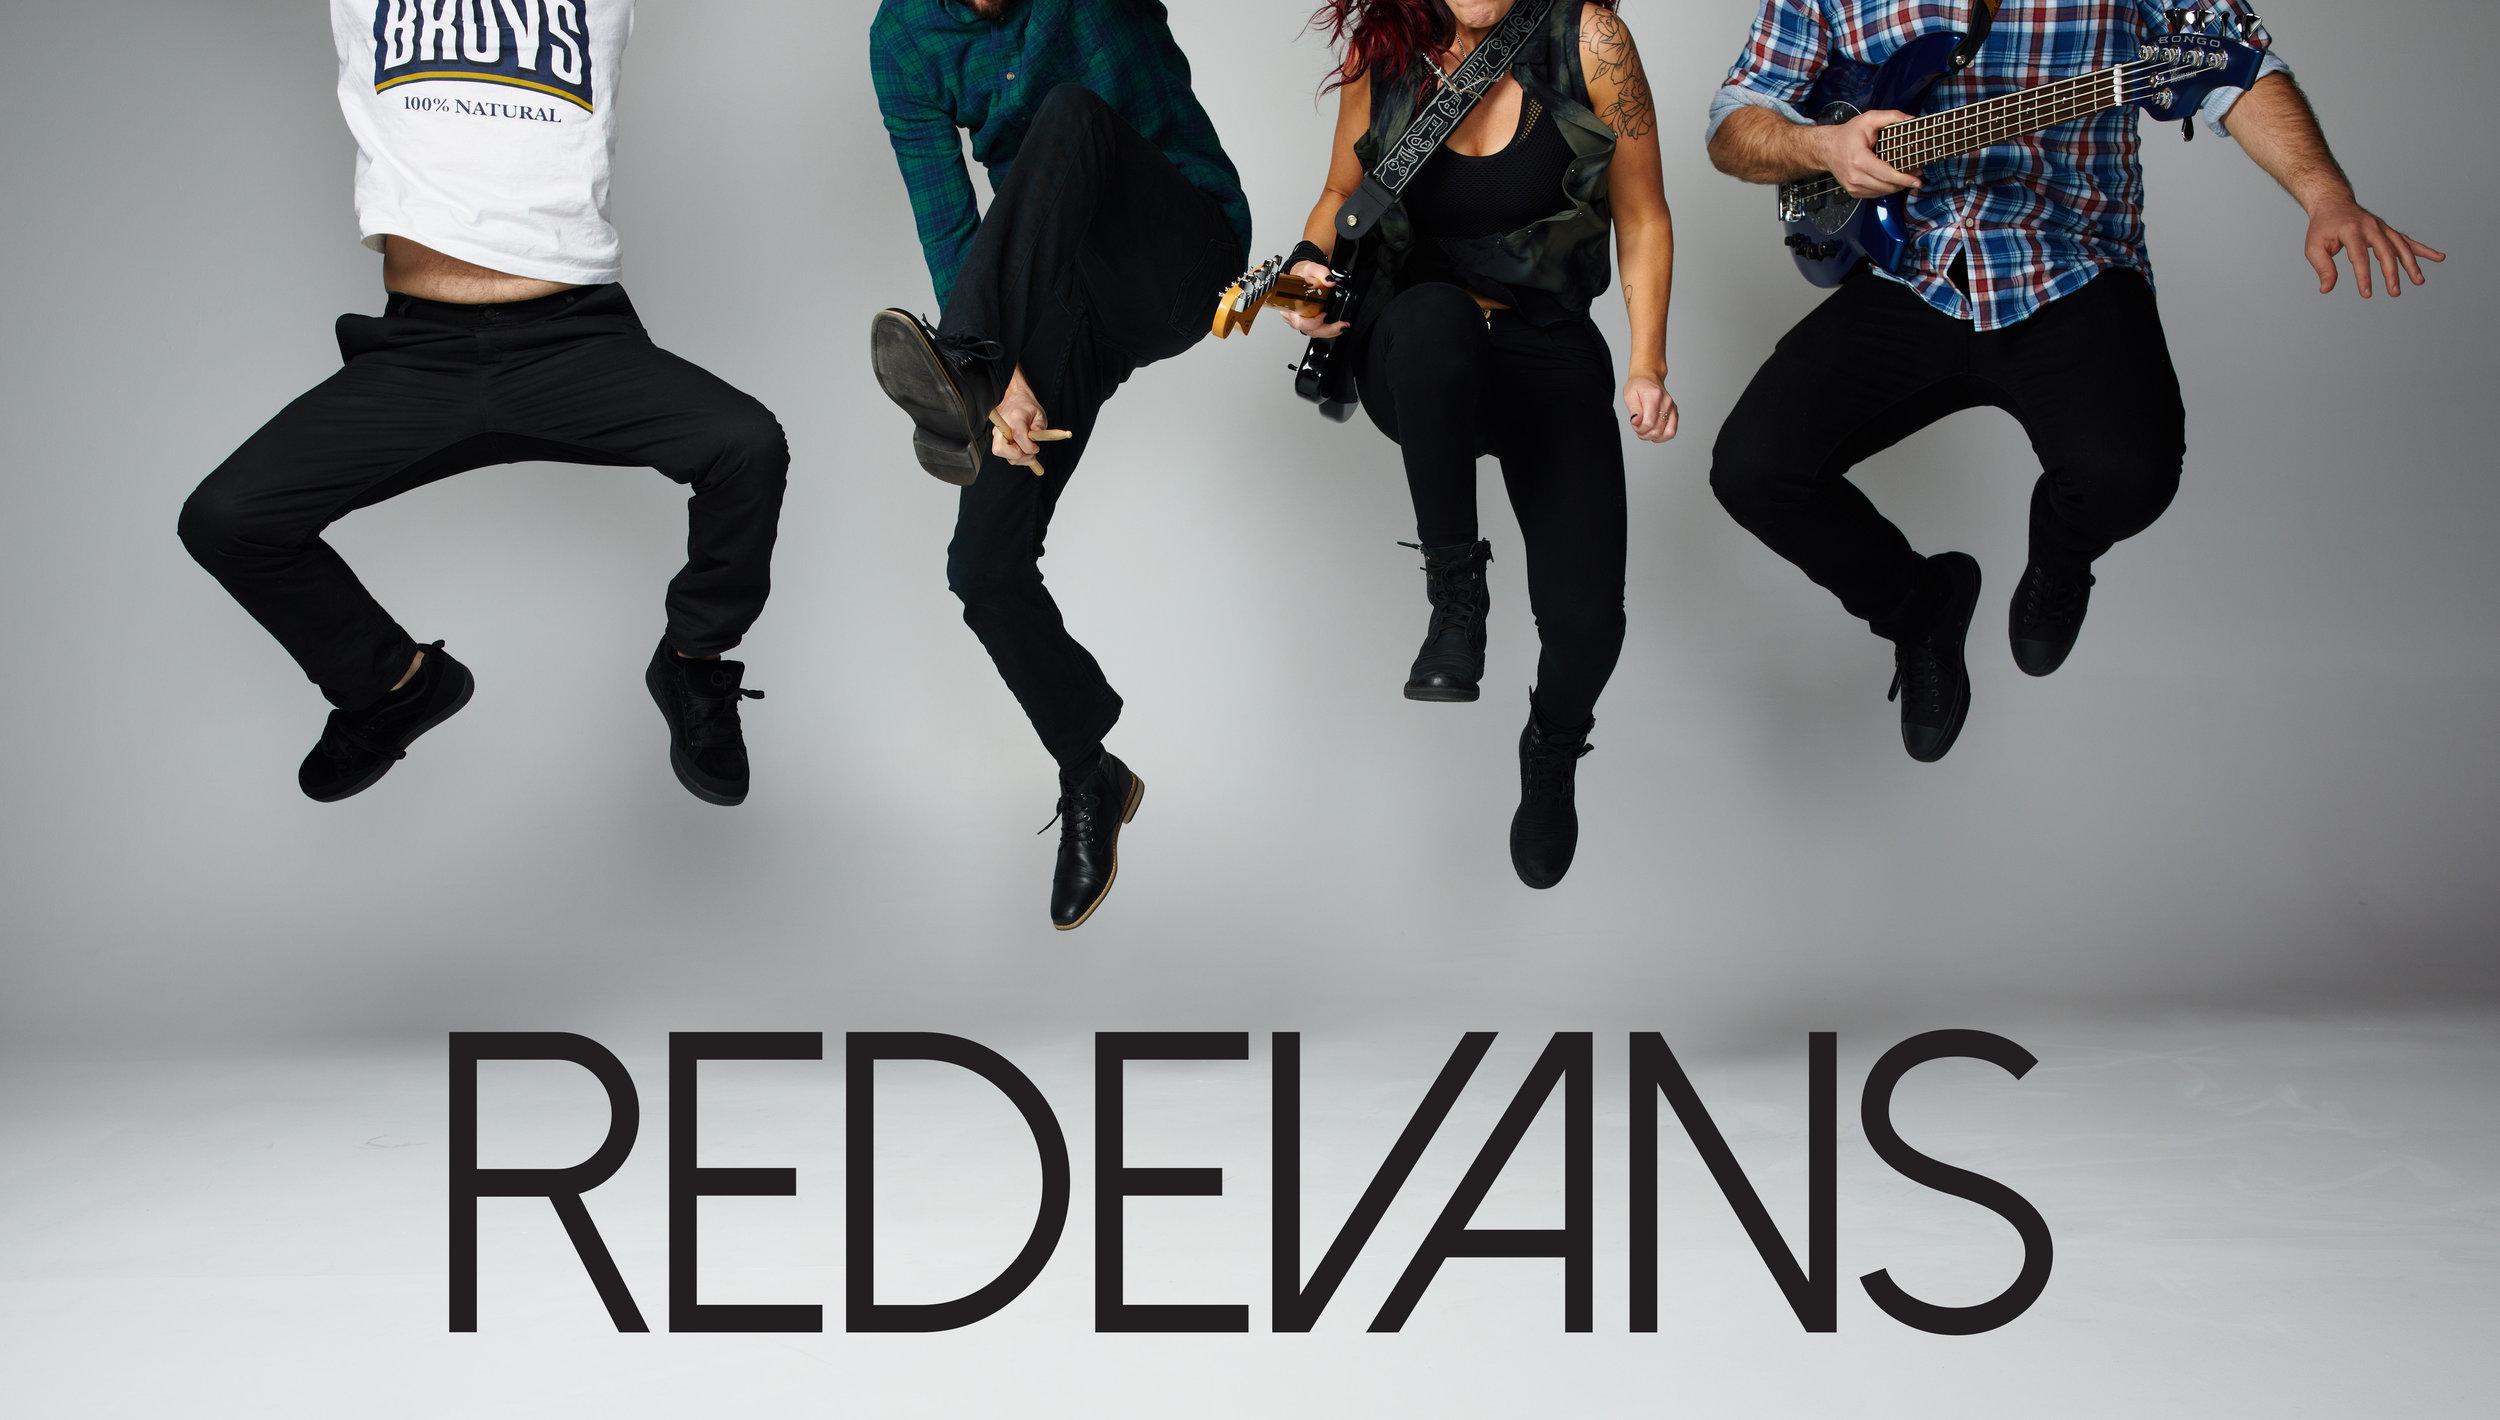 Redevans-Promo-Image-Logo-3.jpg